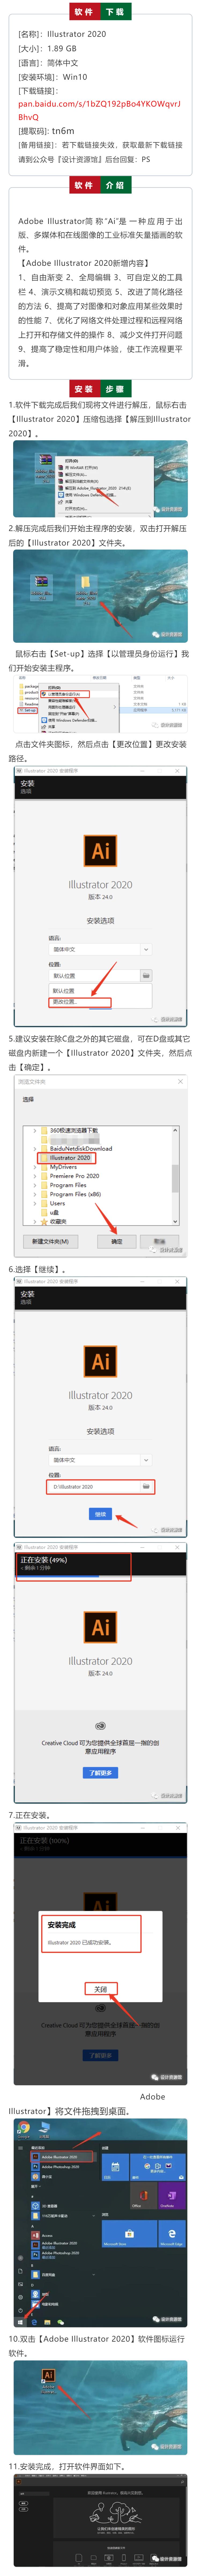 Illustrator CC 2020安装包及教程